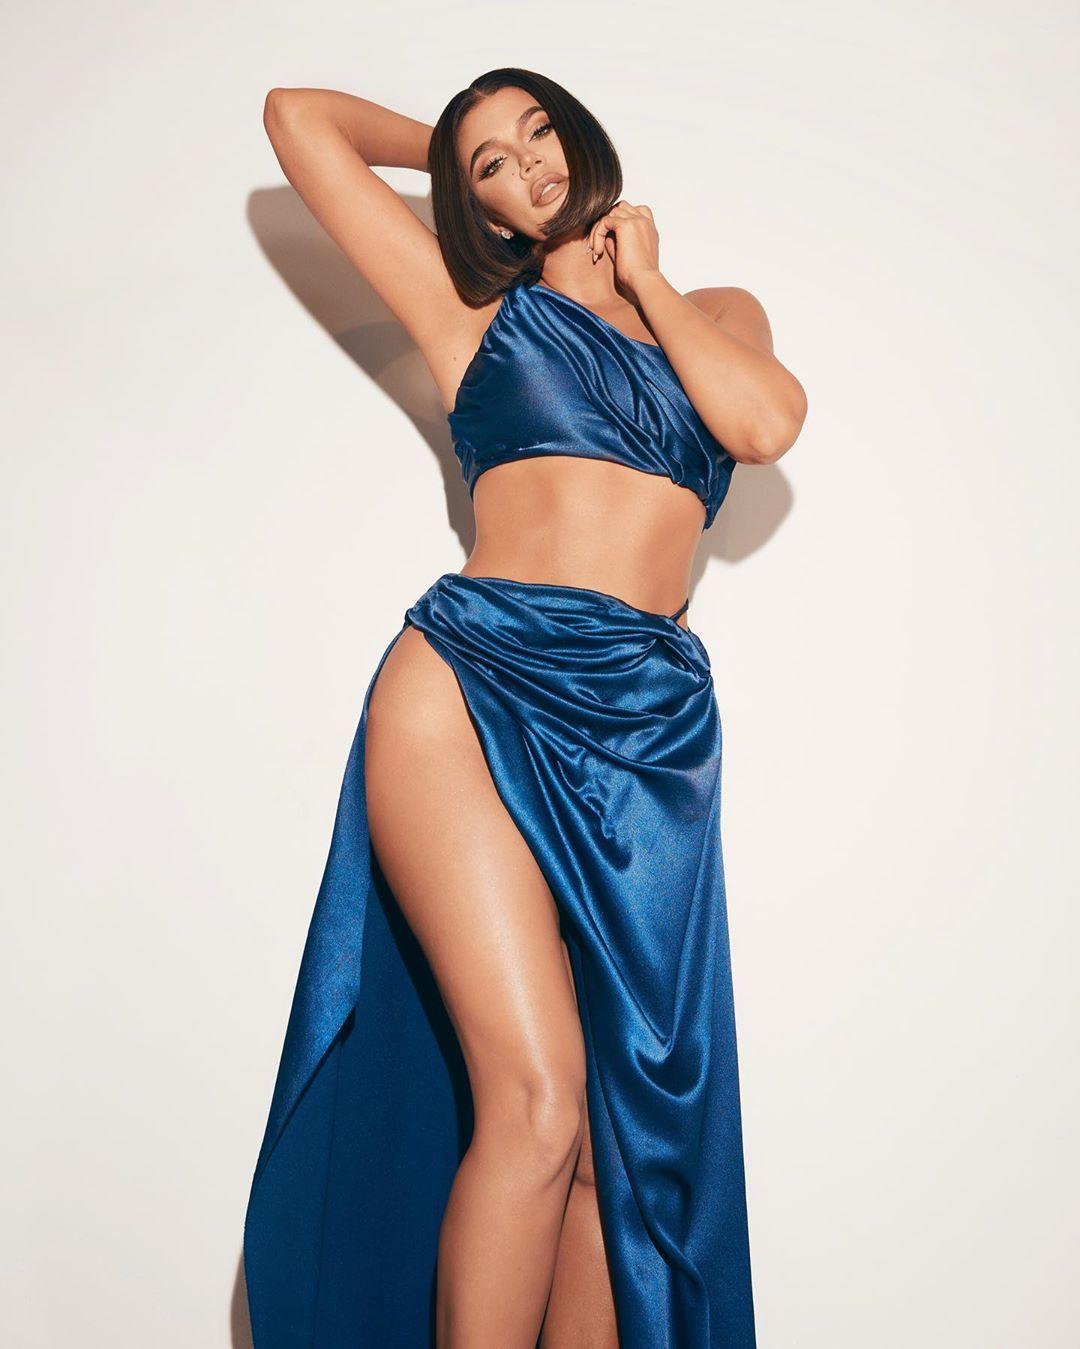 Khloe Kardashian donning a shiny blue slinky matching maxi skirt